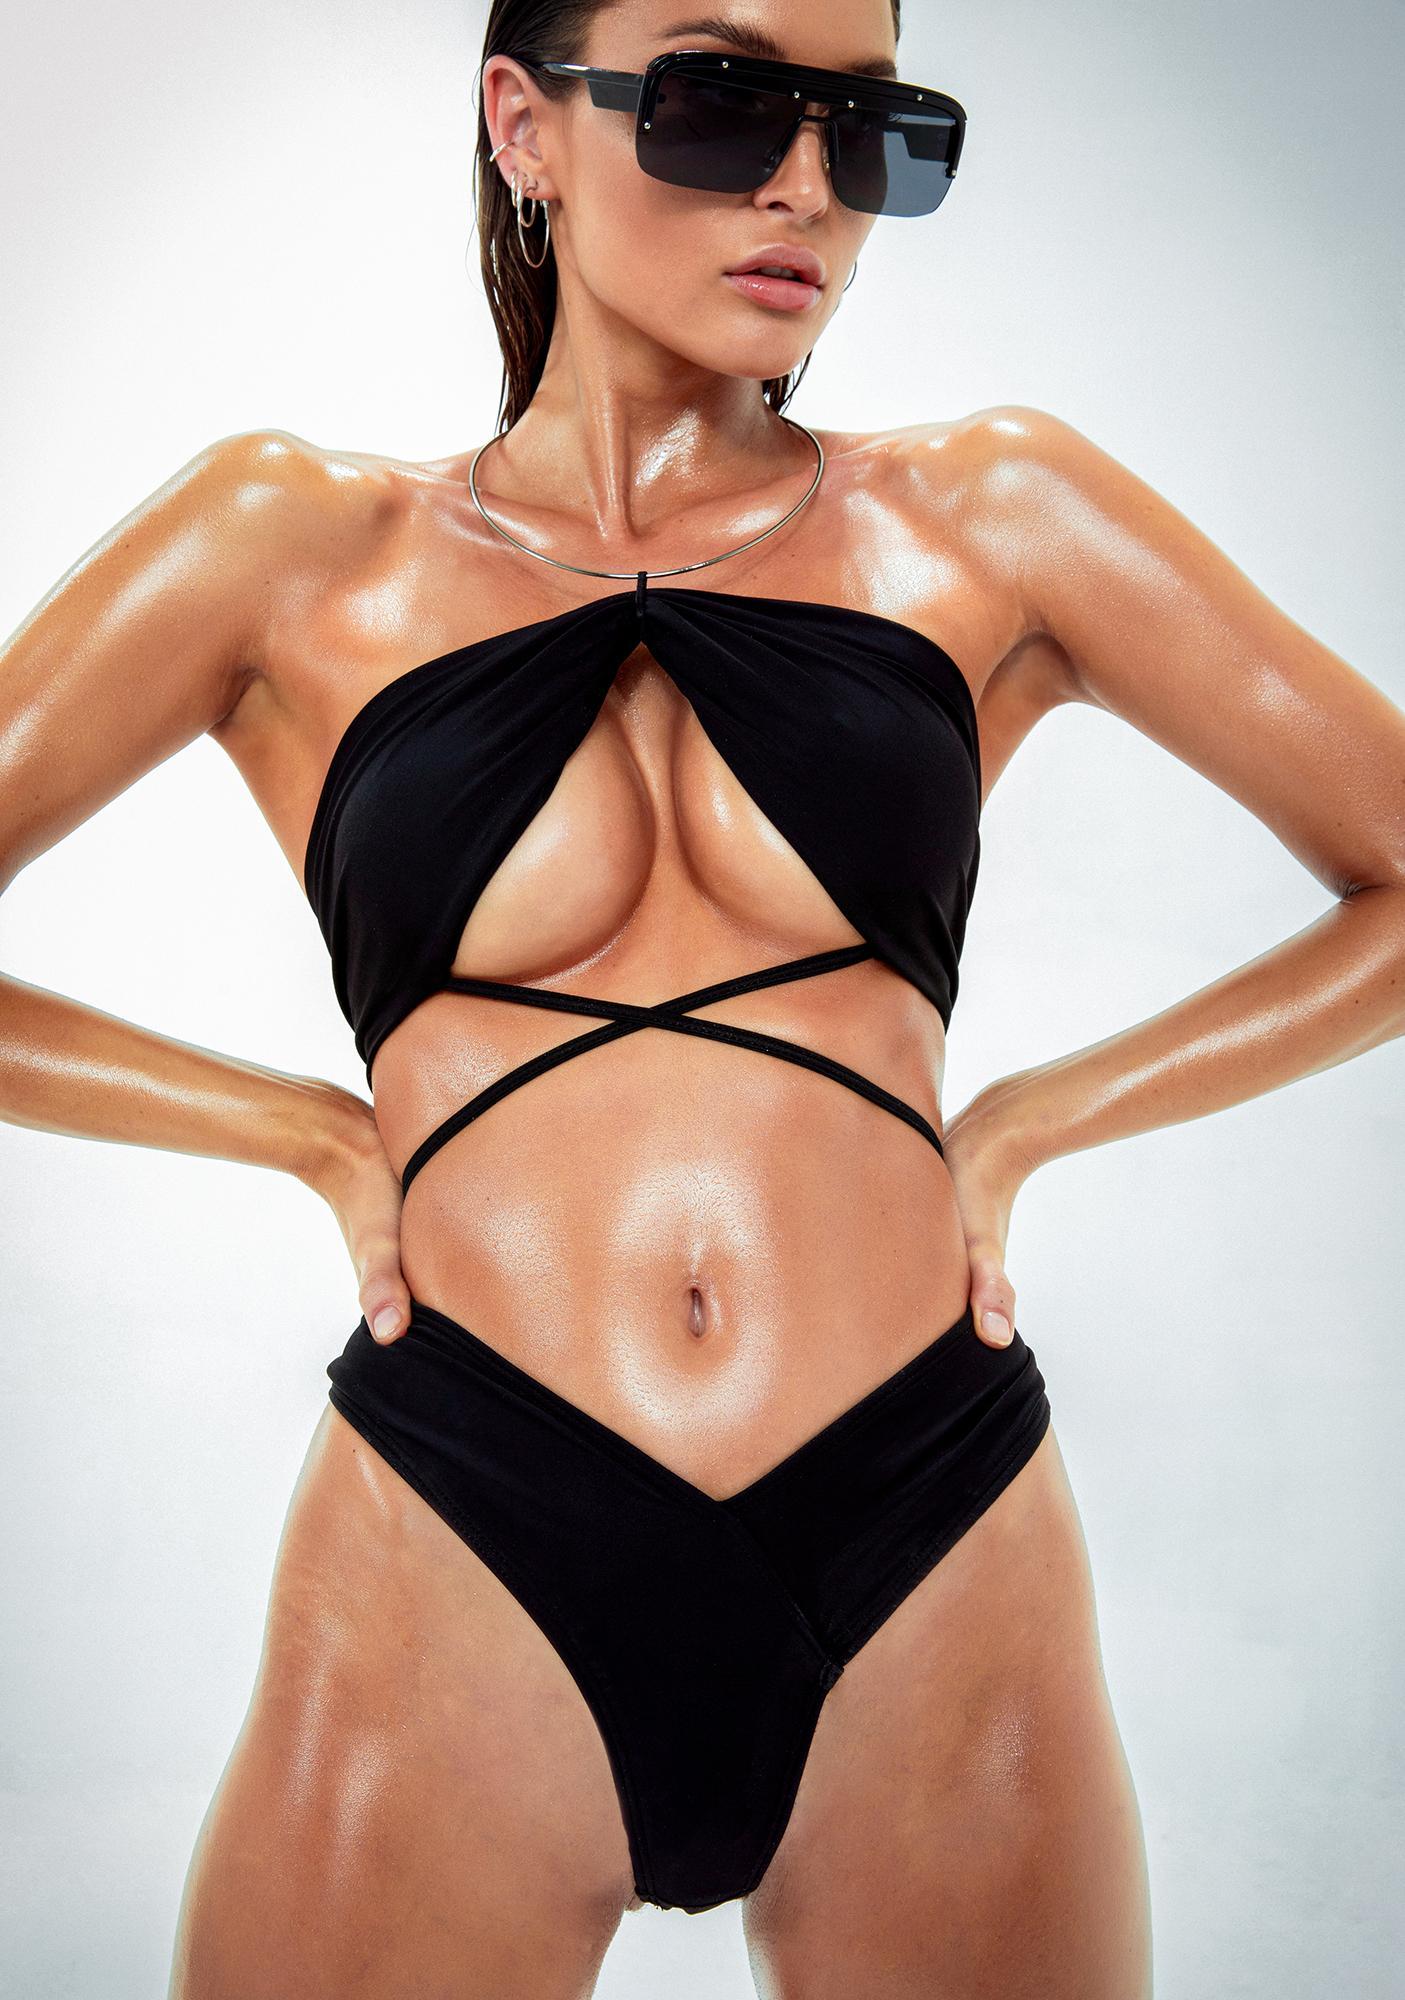 Poster Grl Cabana Cutie Ruched Bikini Set